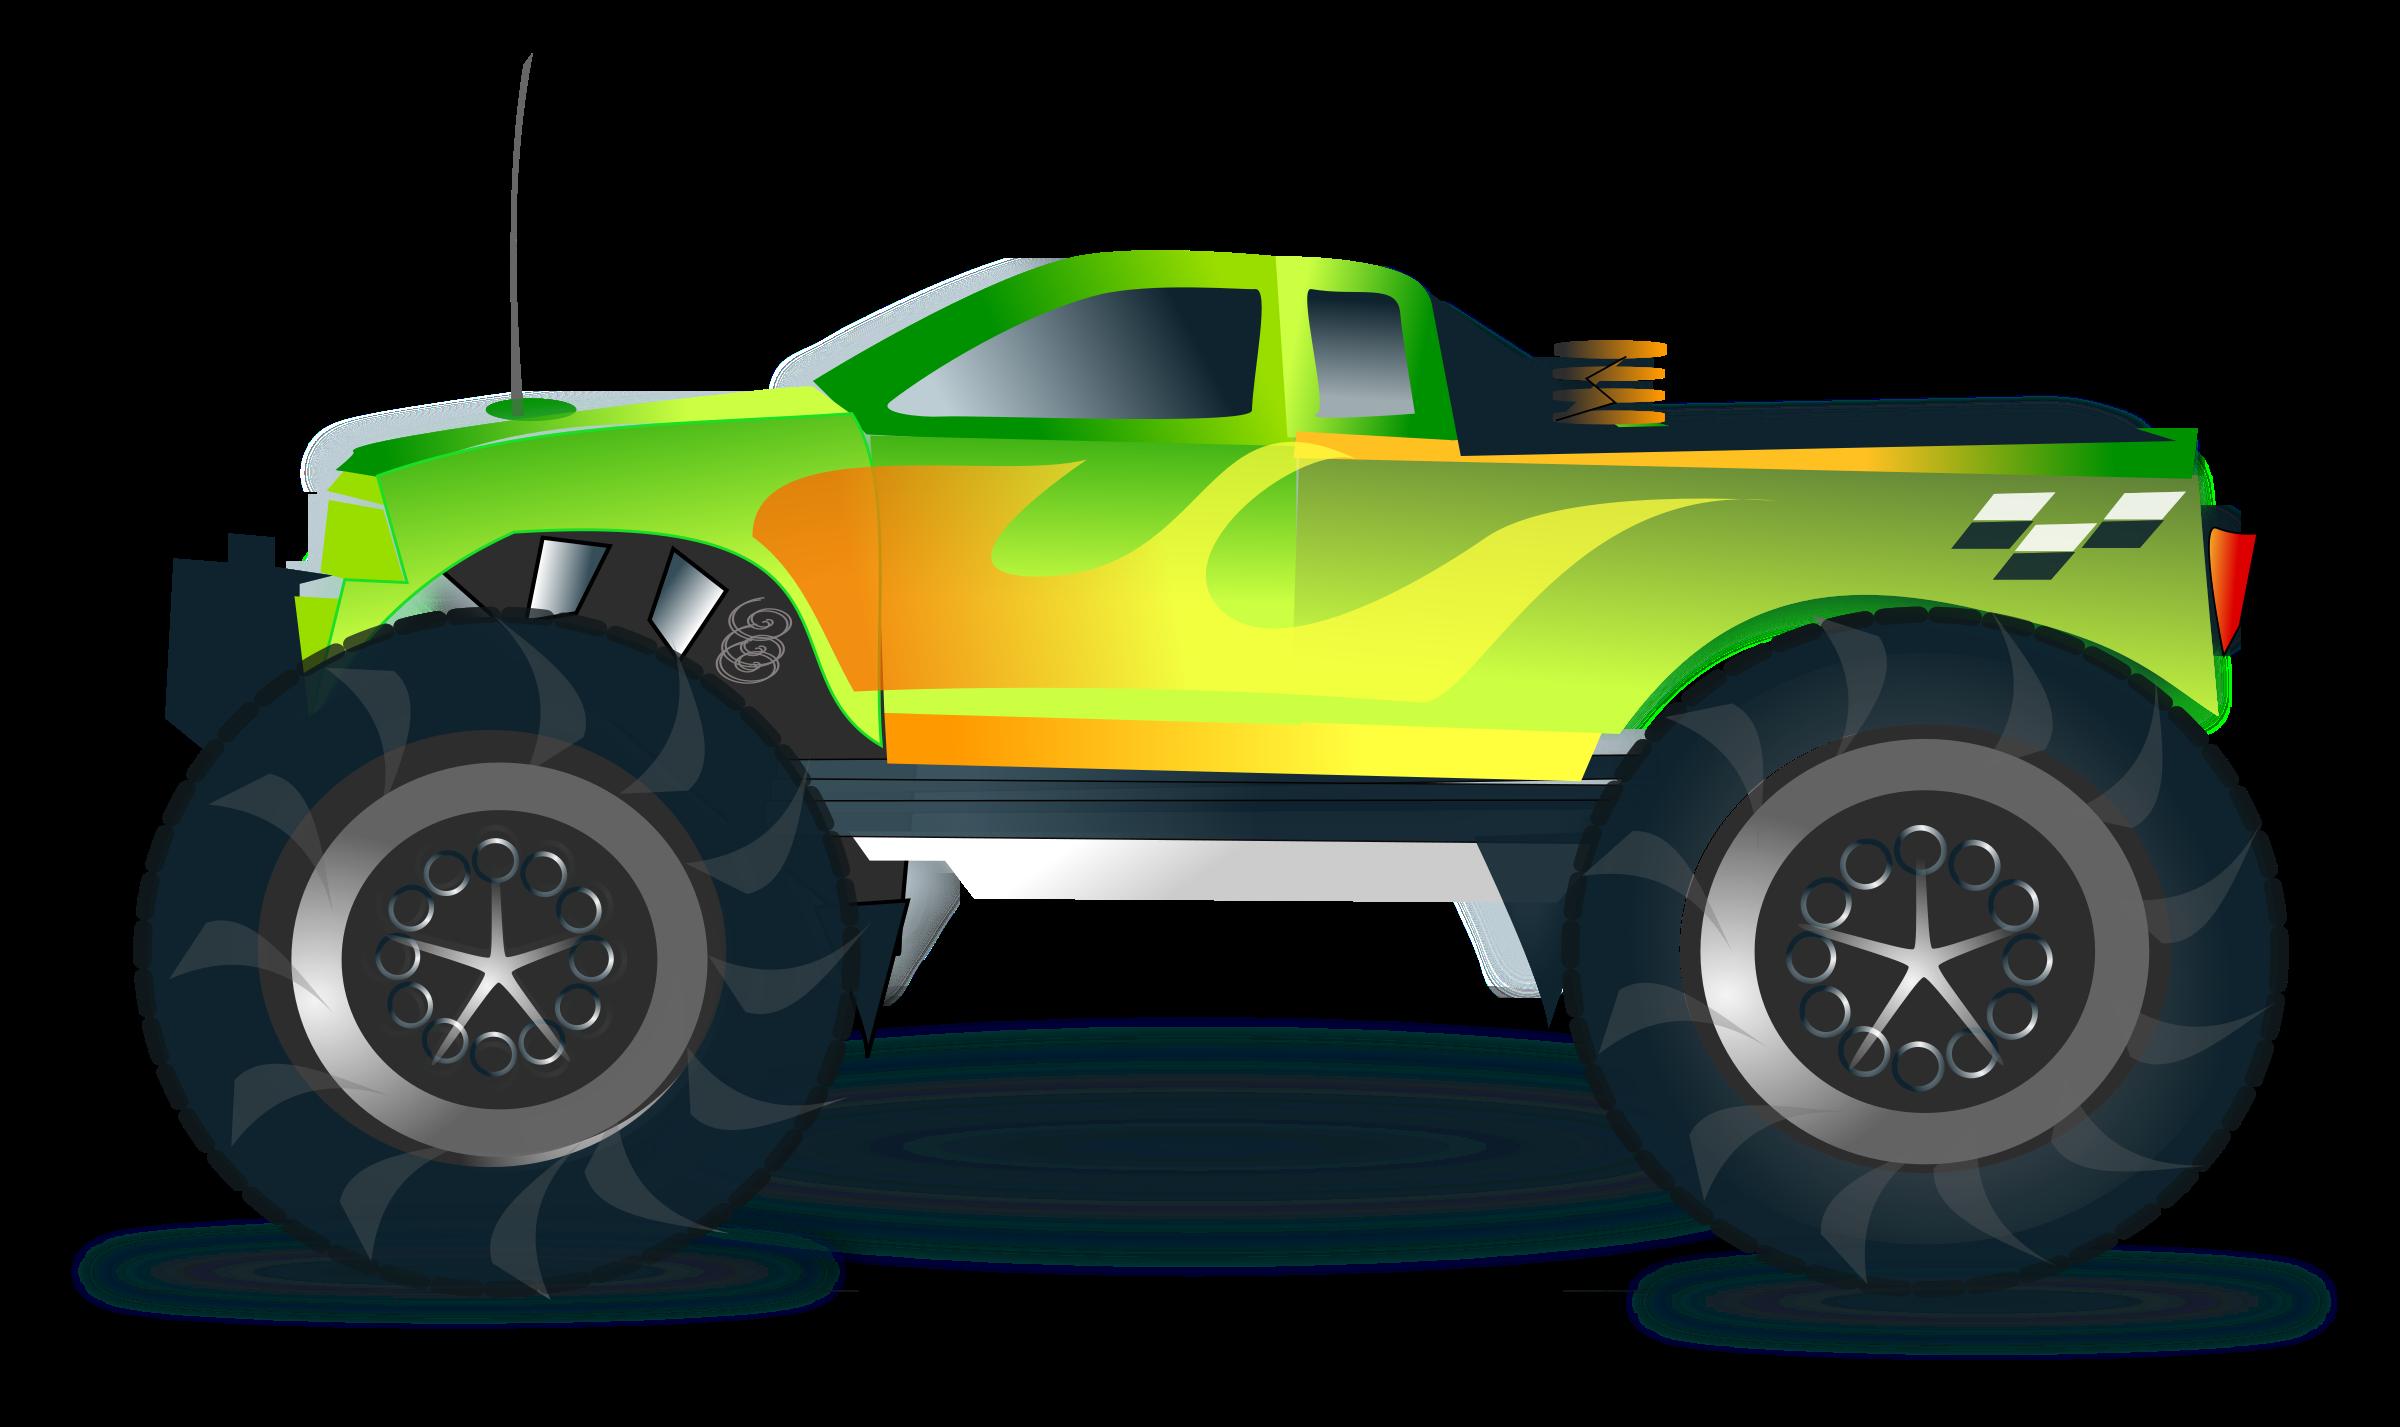 Truck clipart comic Clipart truck monster monster truck